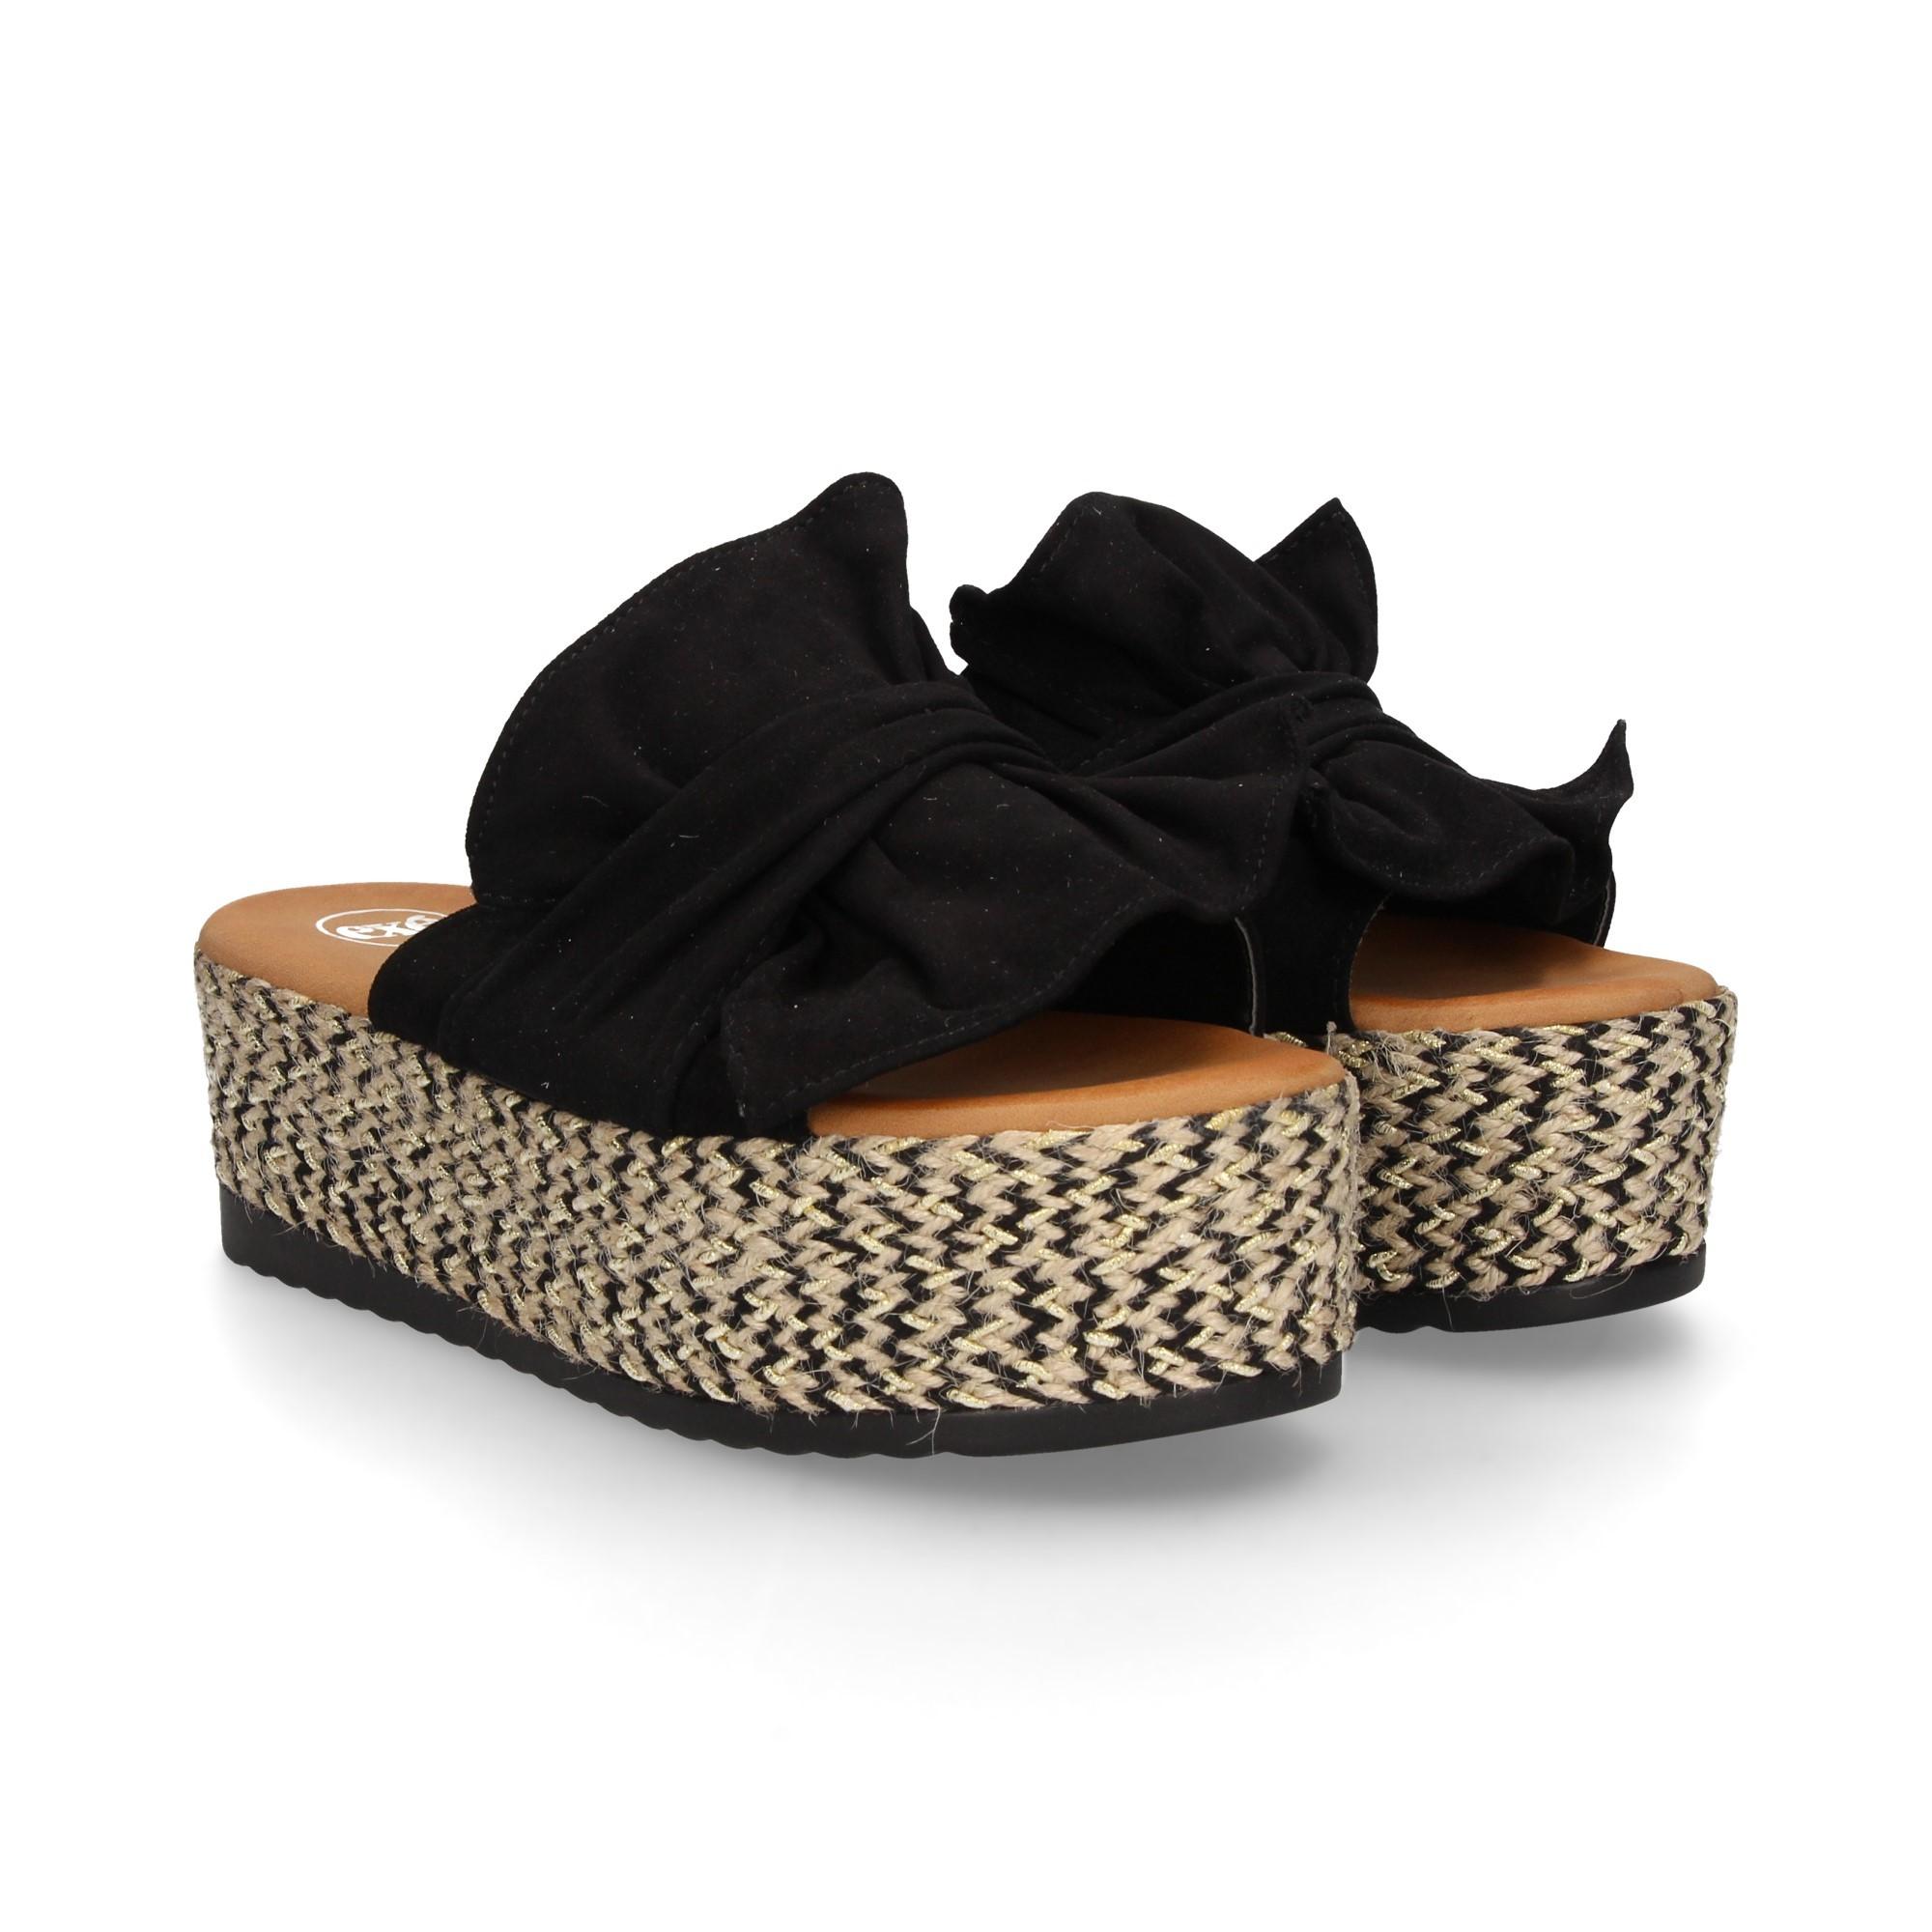 Mujer Cuña Sandalias De Crdbxeoqw Negro B 8896 Exe Y7vfb6gy